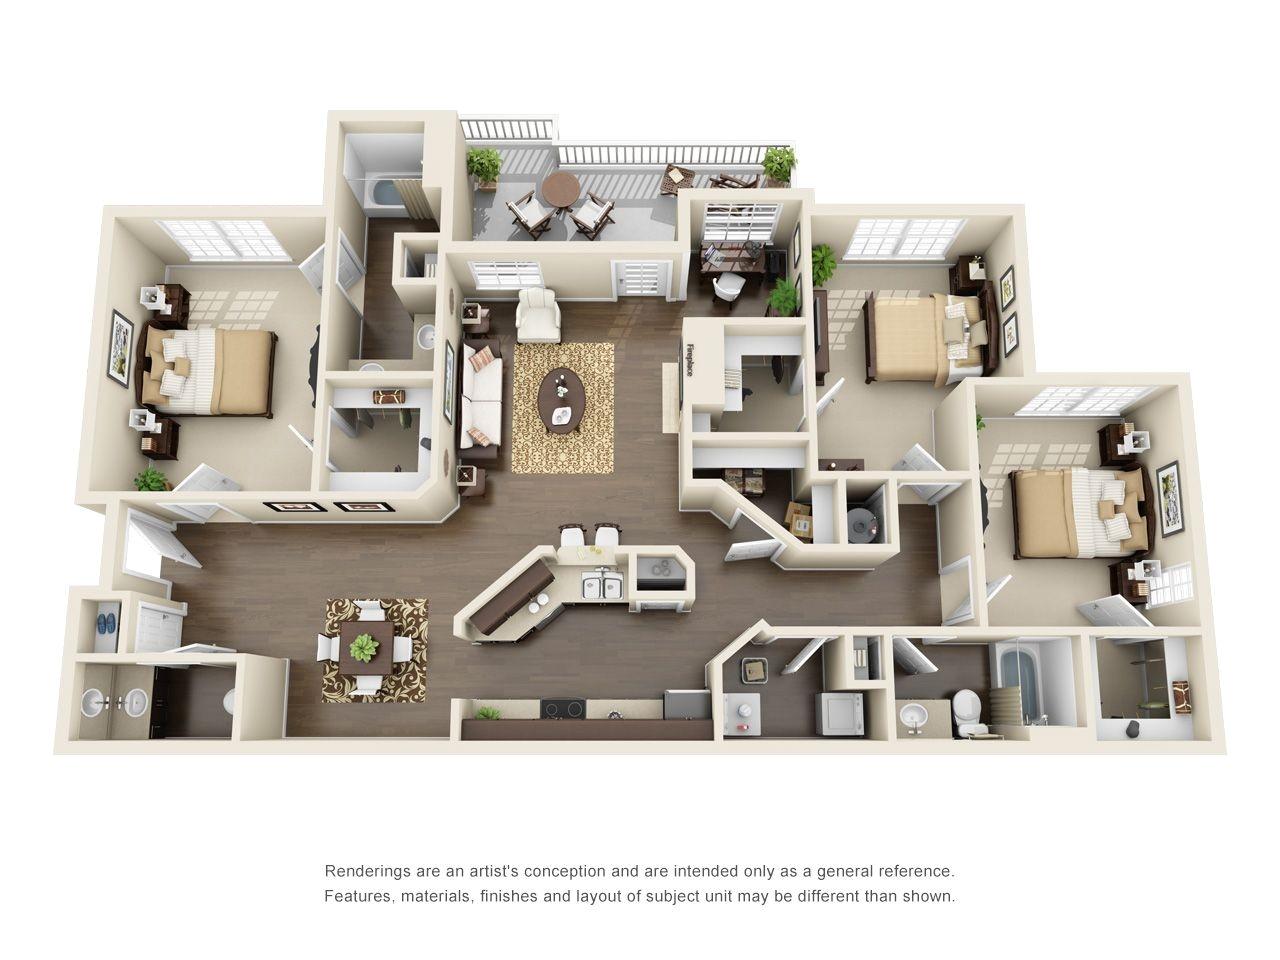 3 bedroom apartments for rent in elizabeth nj 3 bedroom apartments fresh apartment 2 bedroom elizabeth